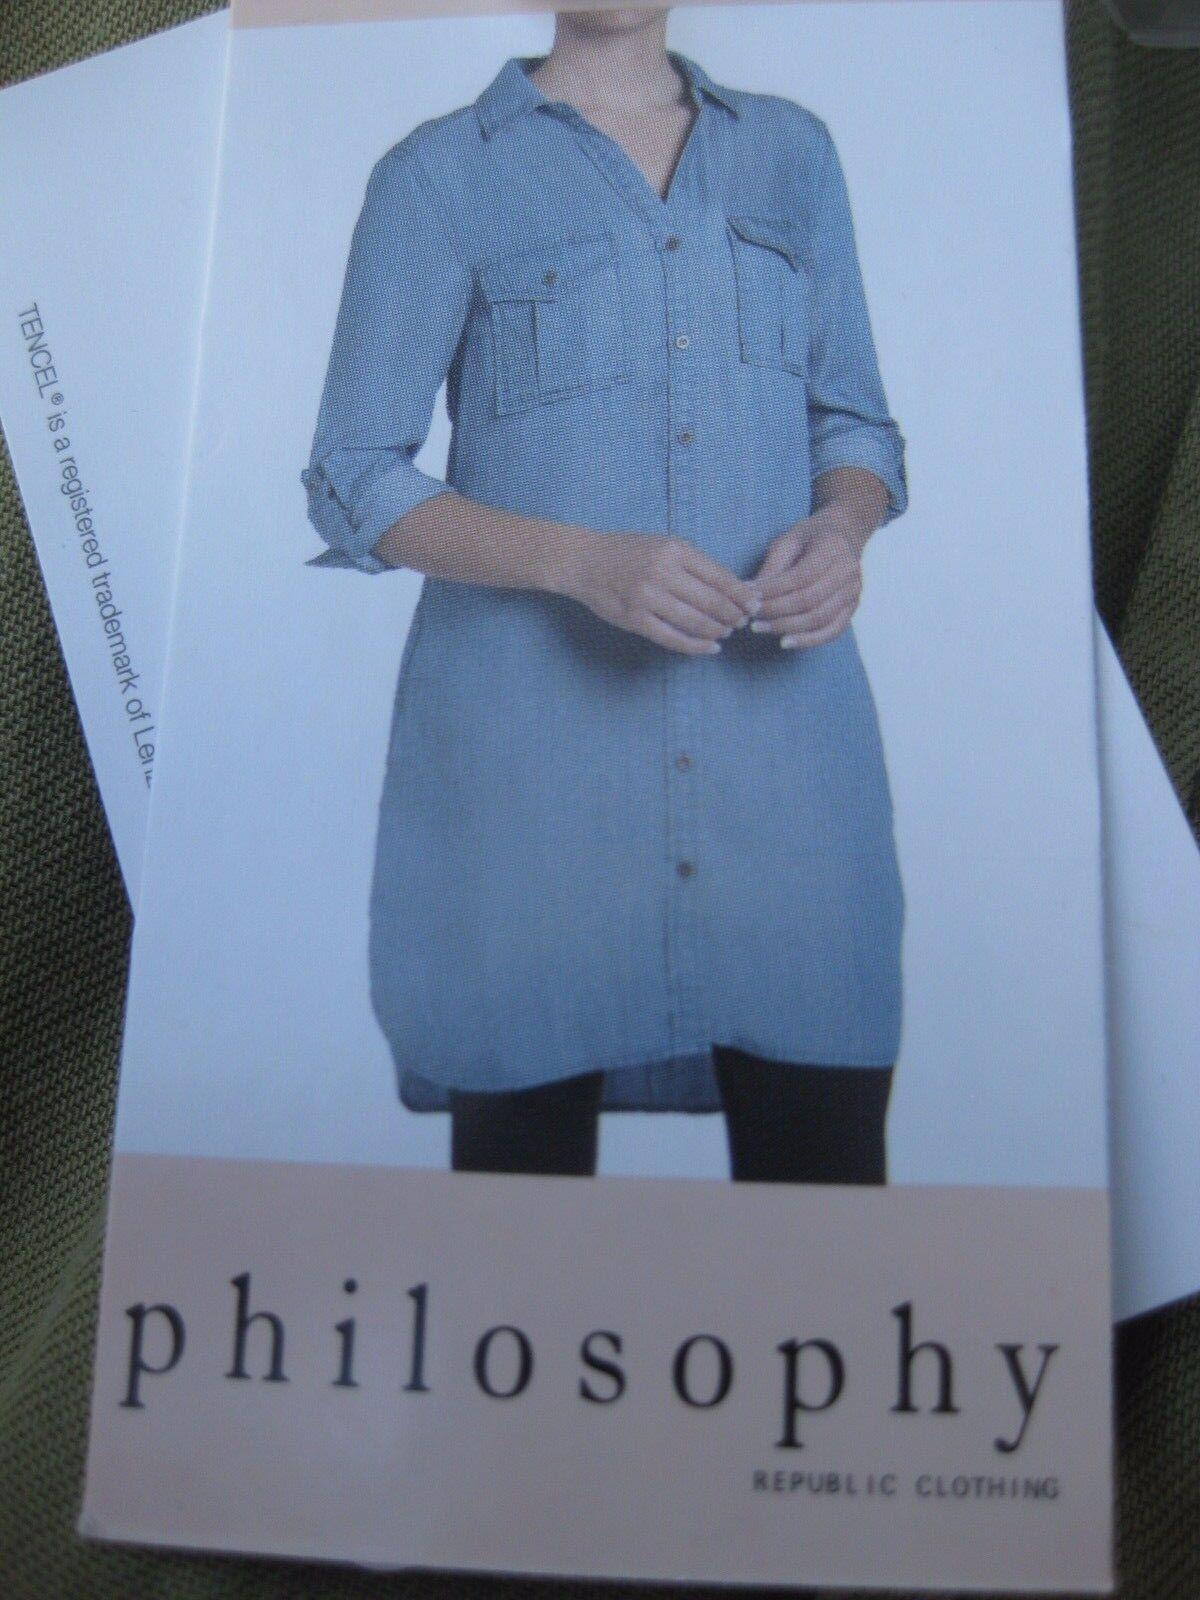 9f33d15b35 Philosophy Tencel Blue Chambray Denim Shirt Dress Tunic Top Button XXL 2x  for sale online